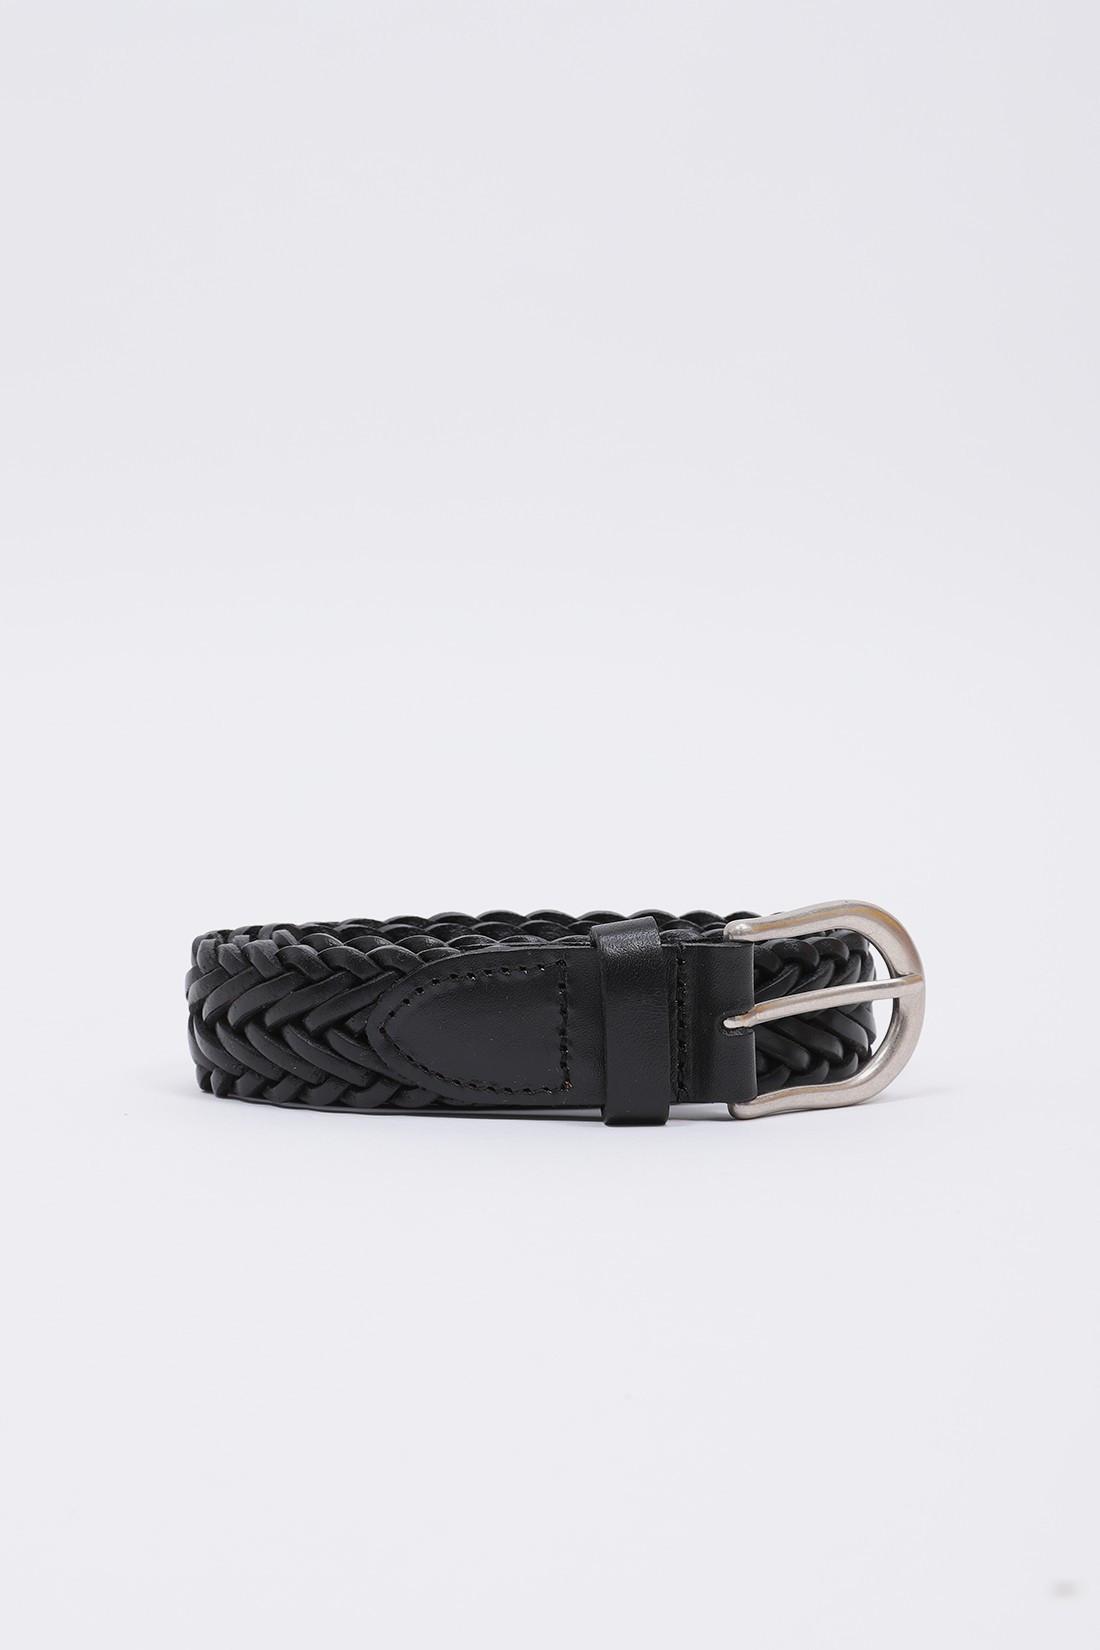 BEAMS PLUS / Leather mesh belt Black